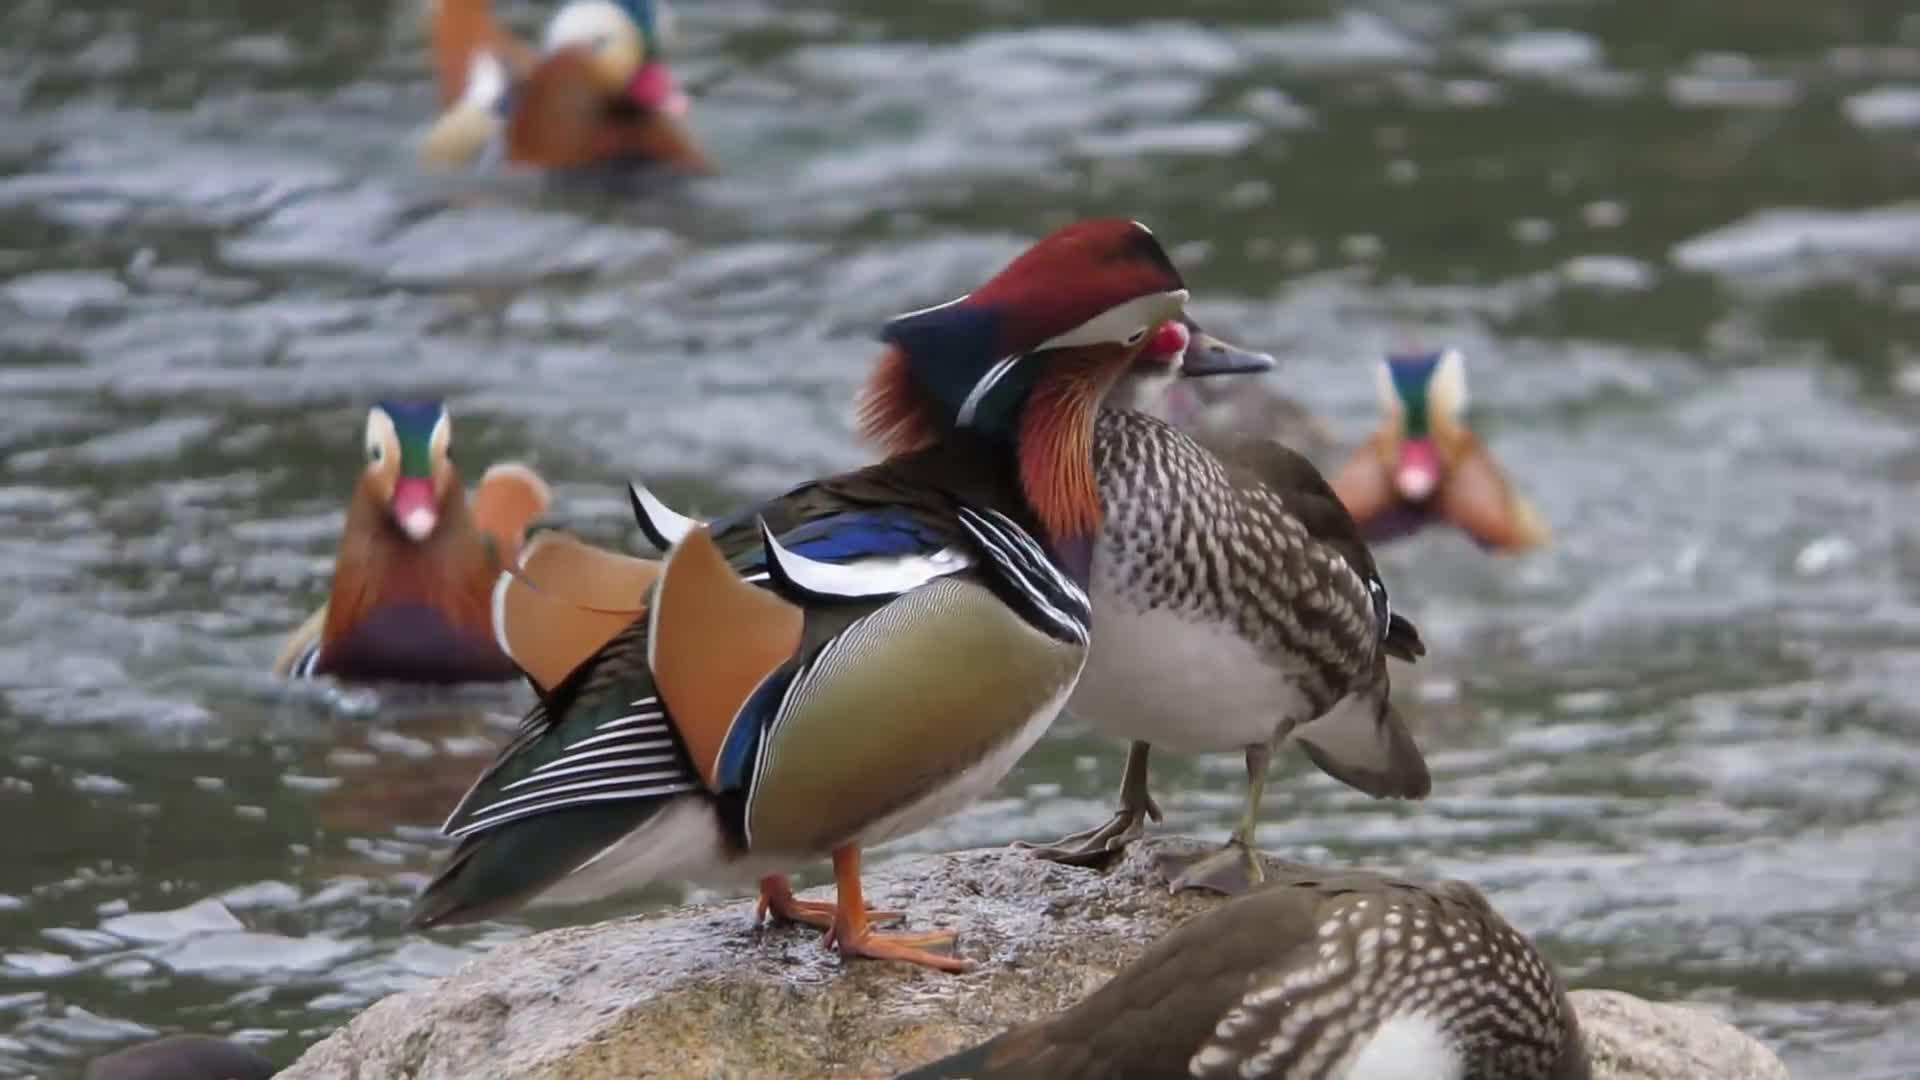 AIX, Birding, Japan, Mandarin, Mandarin Duck, duck, female, galericulata, male, ometrist, recommend, おしどり, おしどり夫婦, オシドリ, オシドリ夫婦, オシドリ観察小屋, 日野川, Mandarin Ducks GIFs